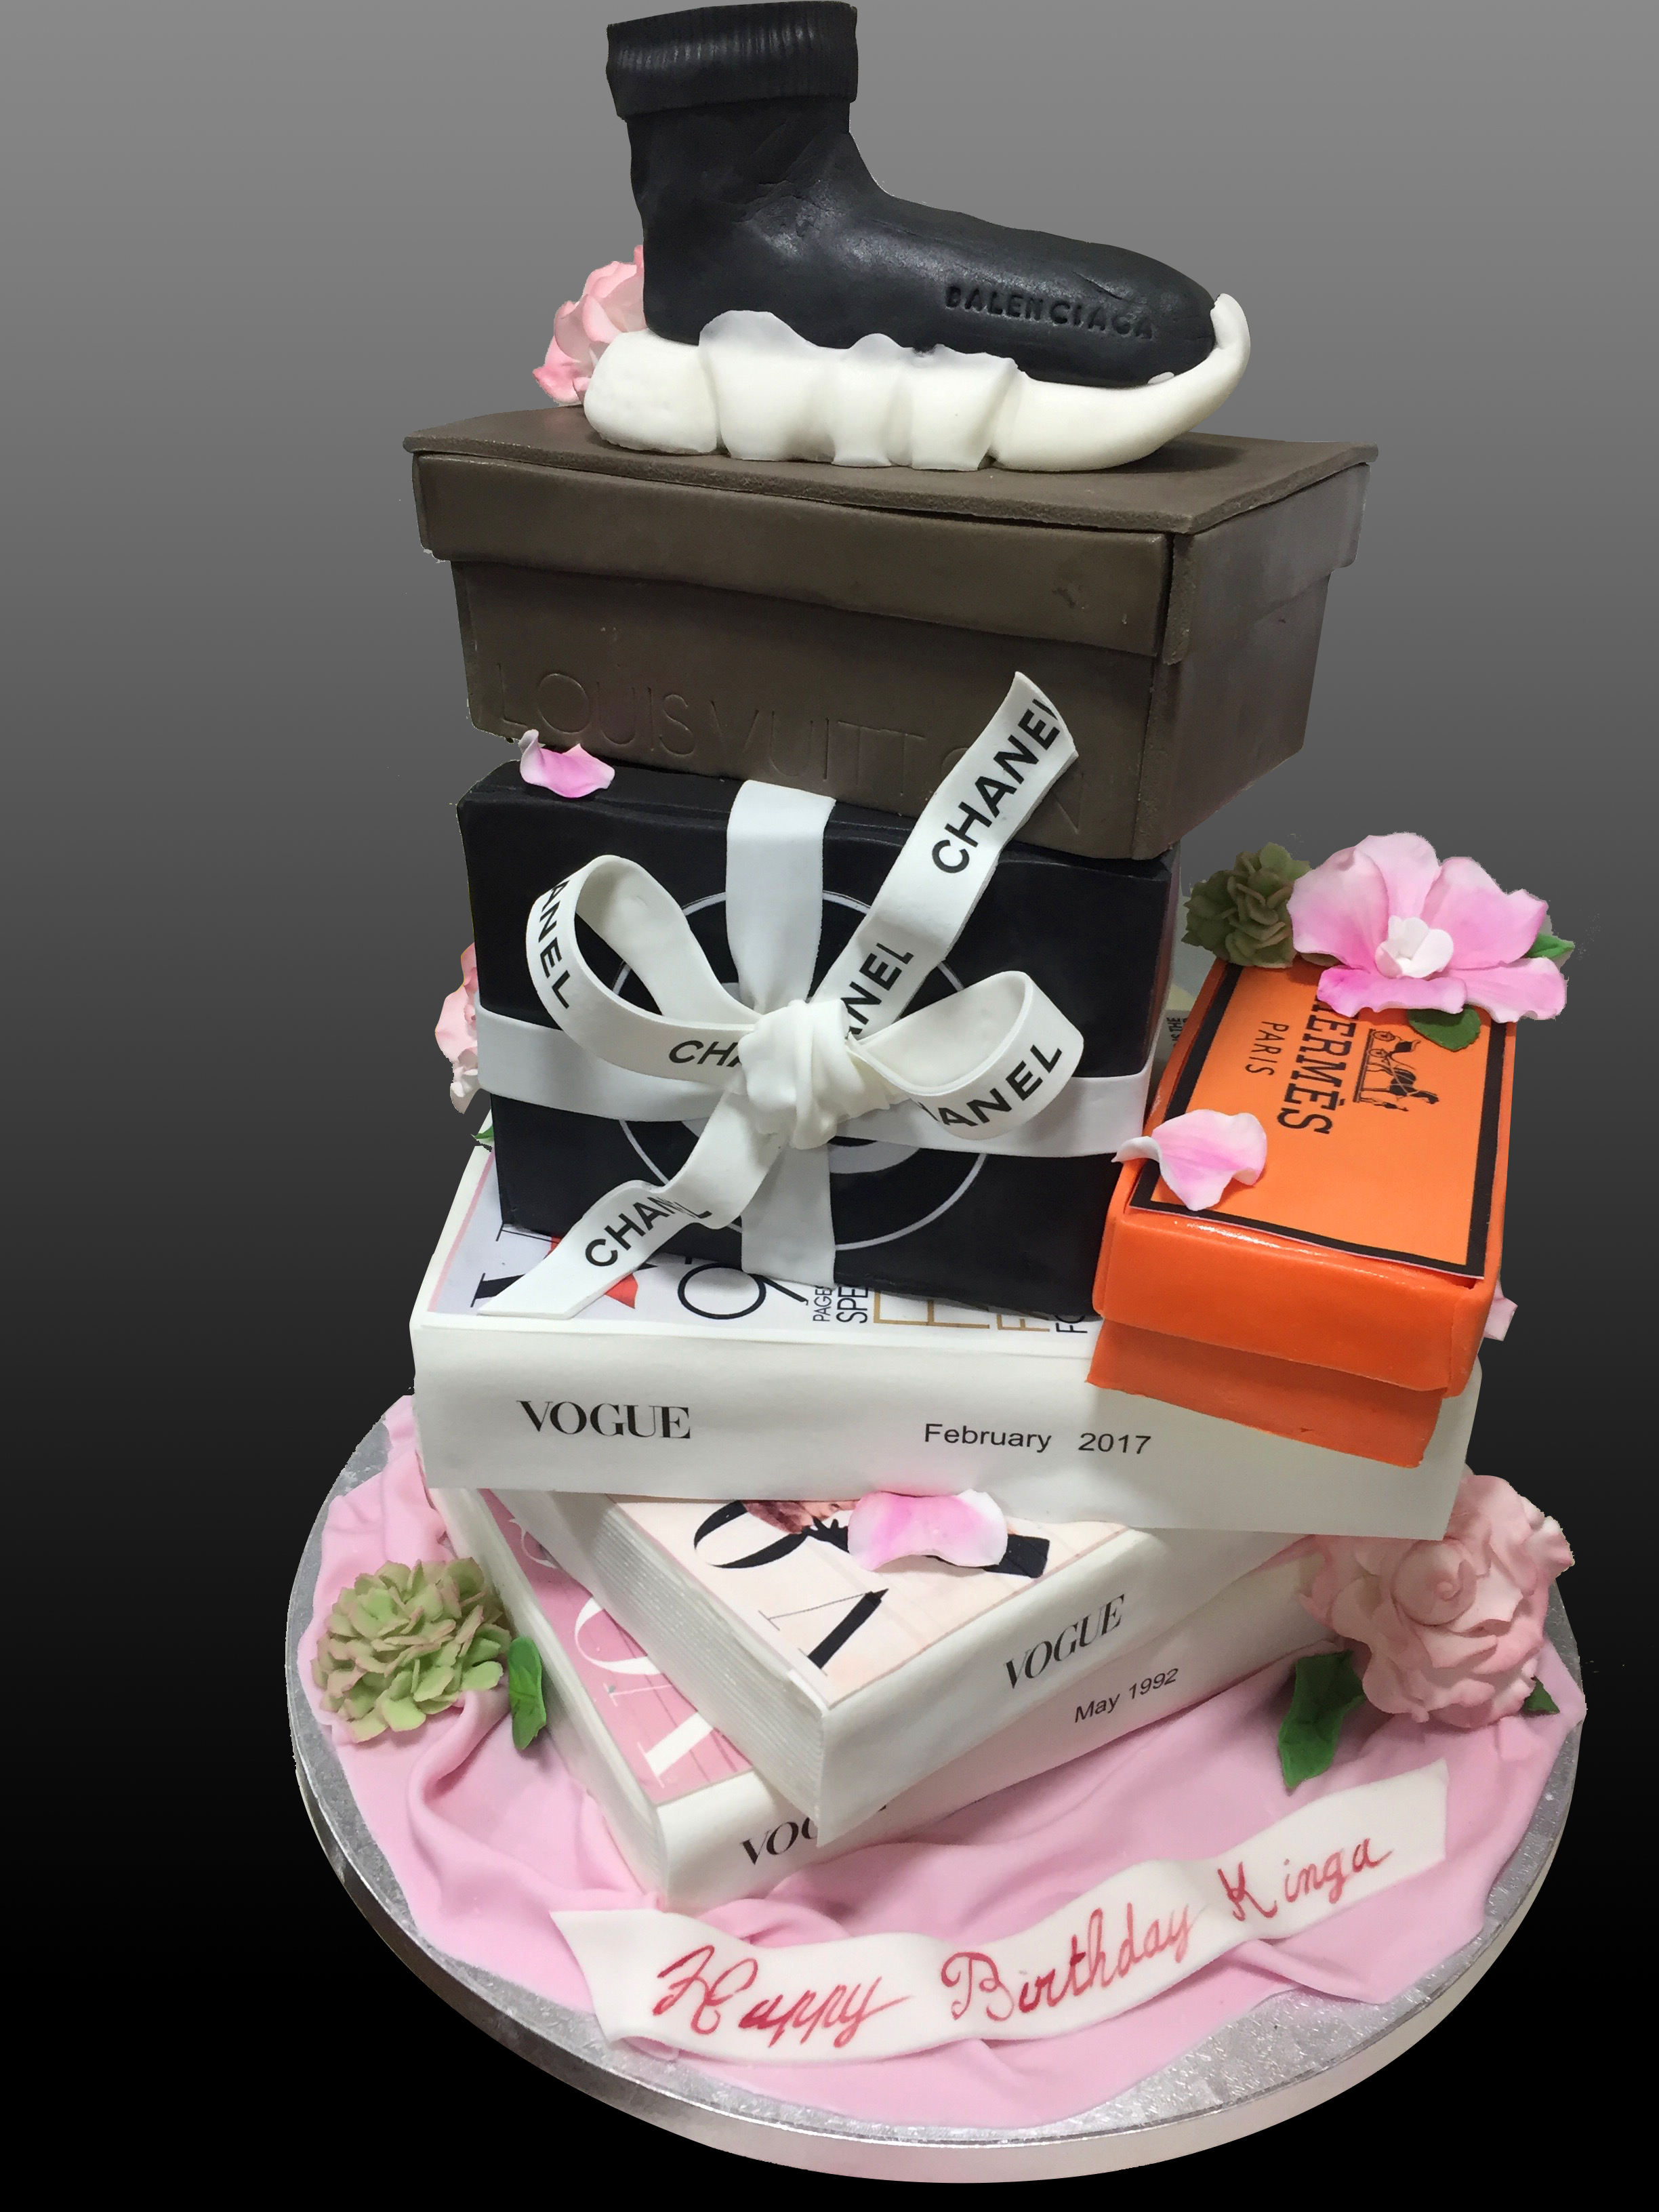 brandz cake